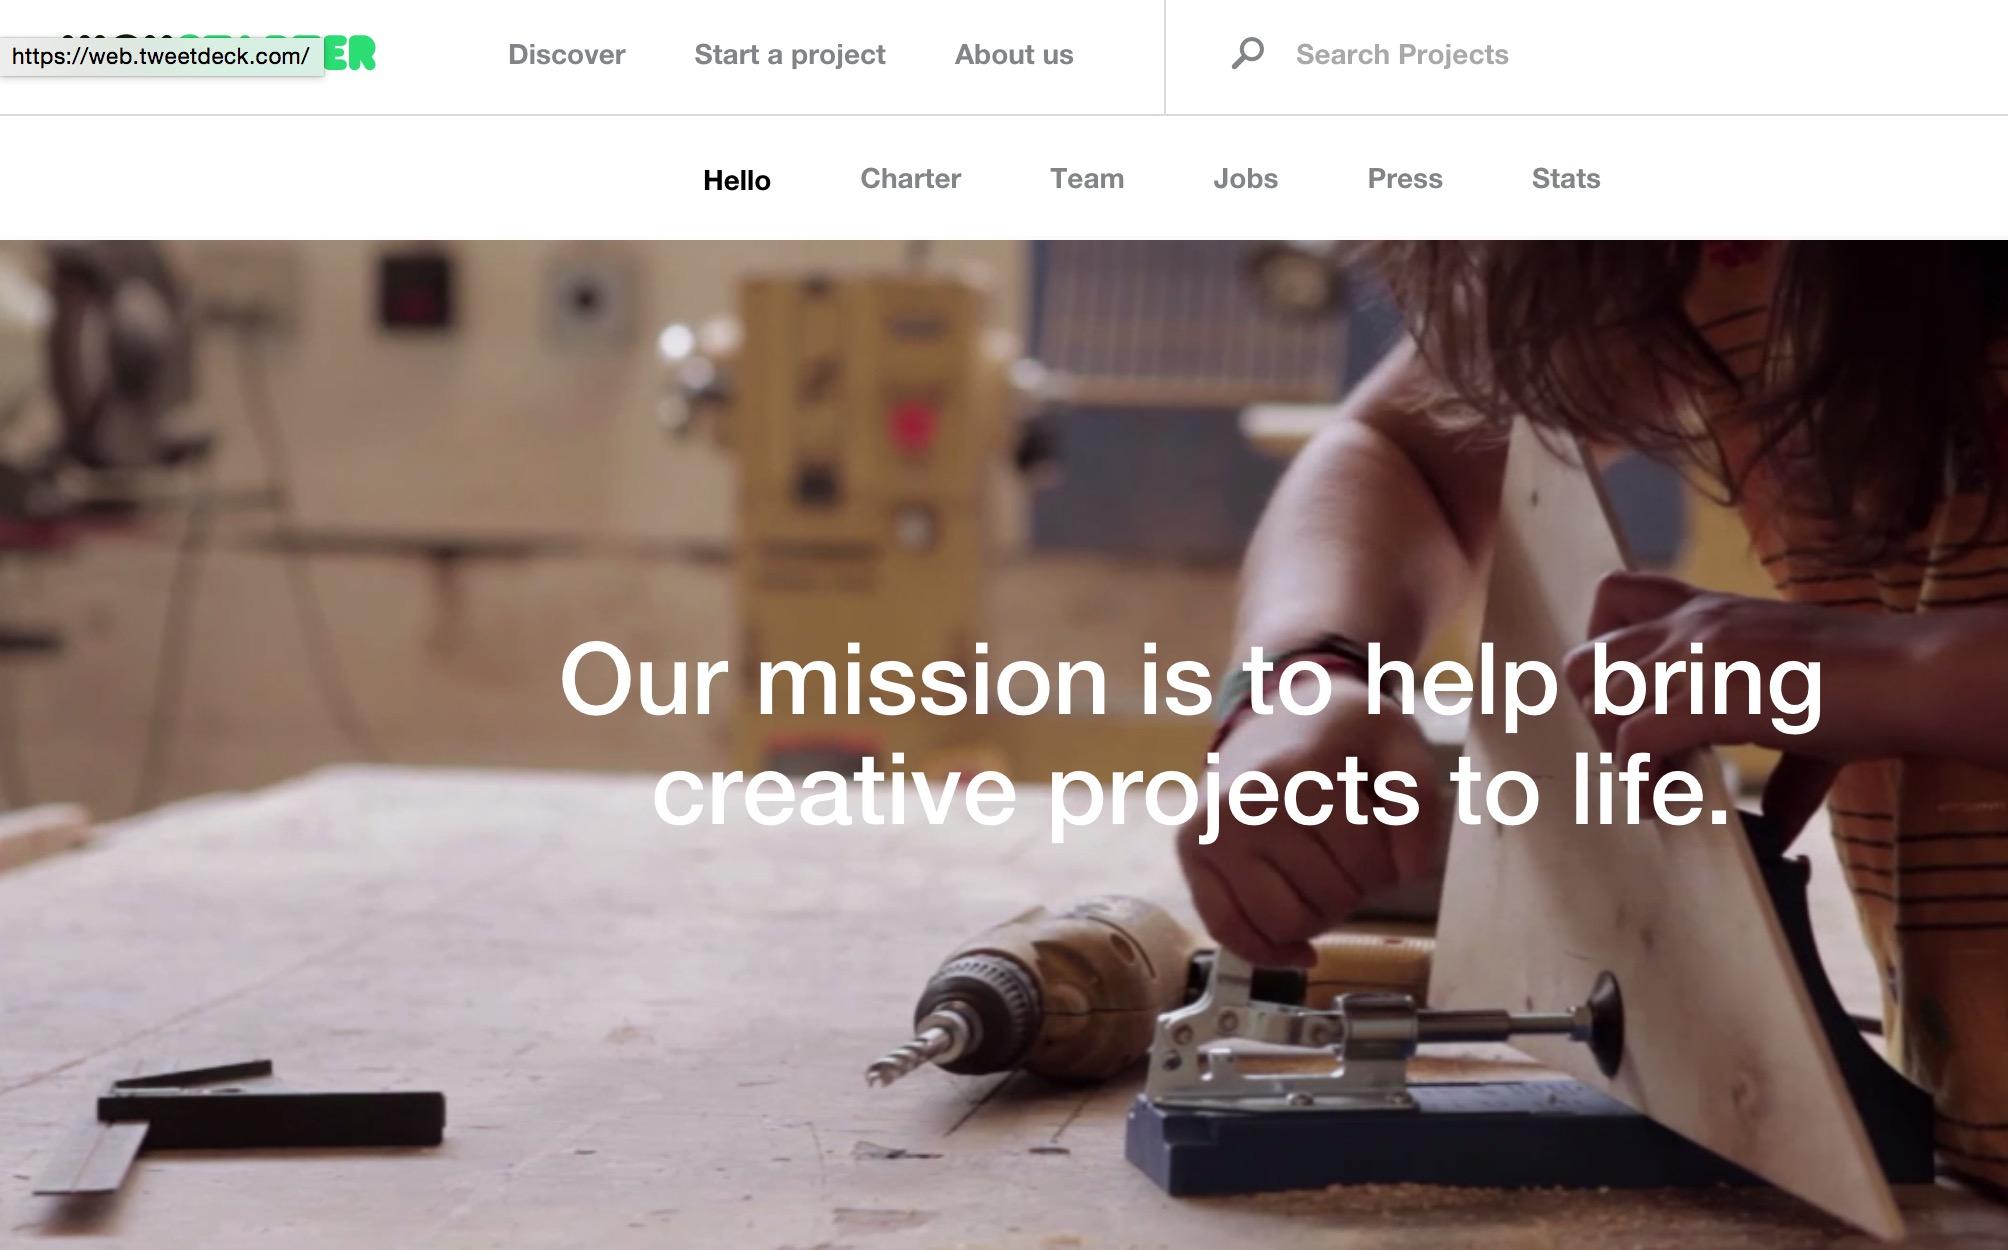 Crowdfunding | Kickstarter wird gemeinnützig #Startups